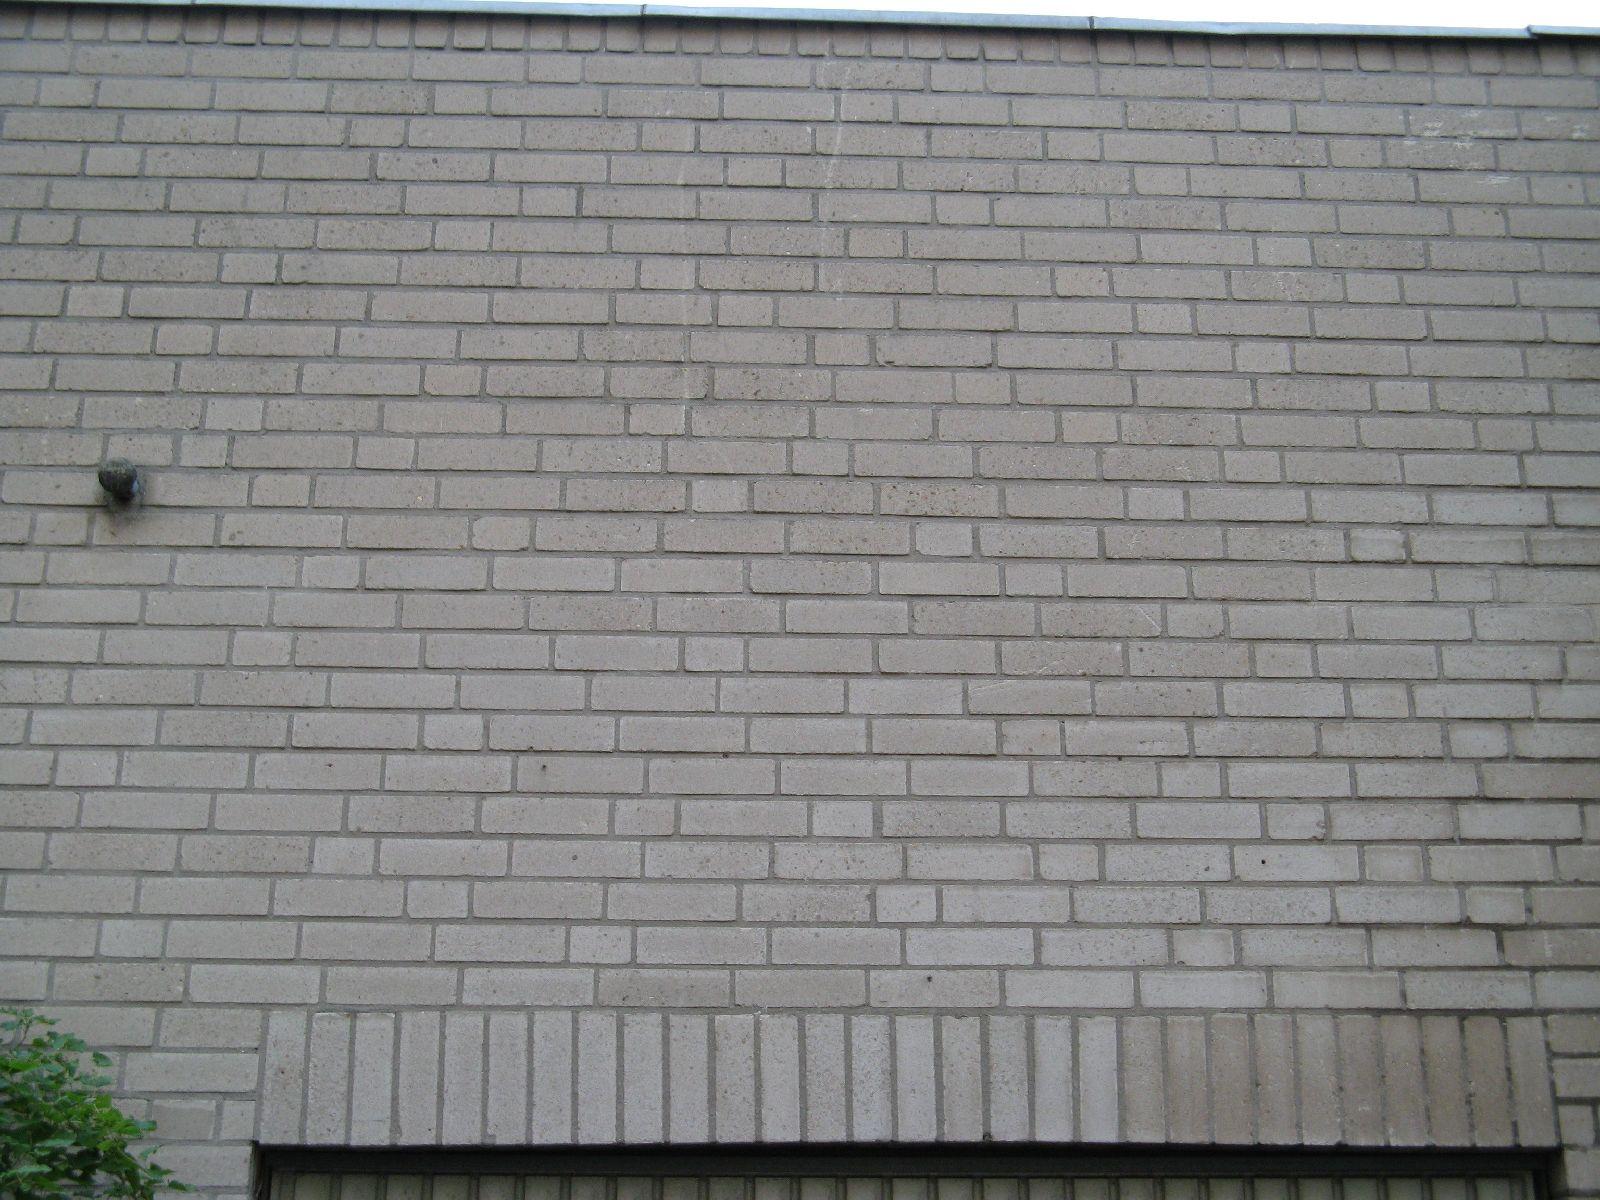 Brick_Texture_B_0716